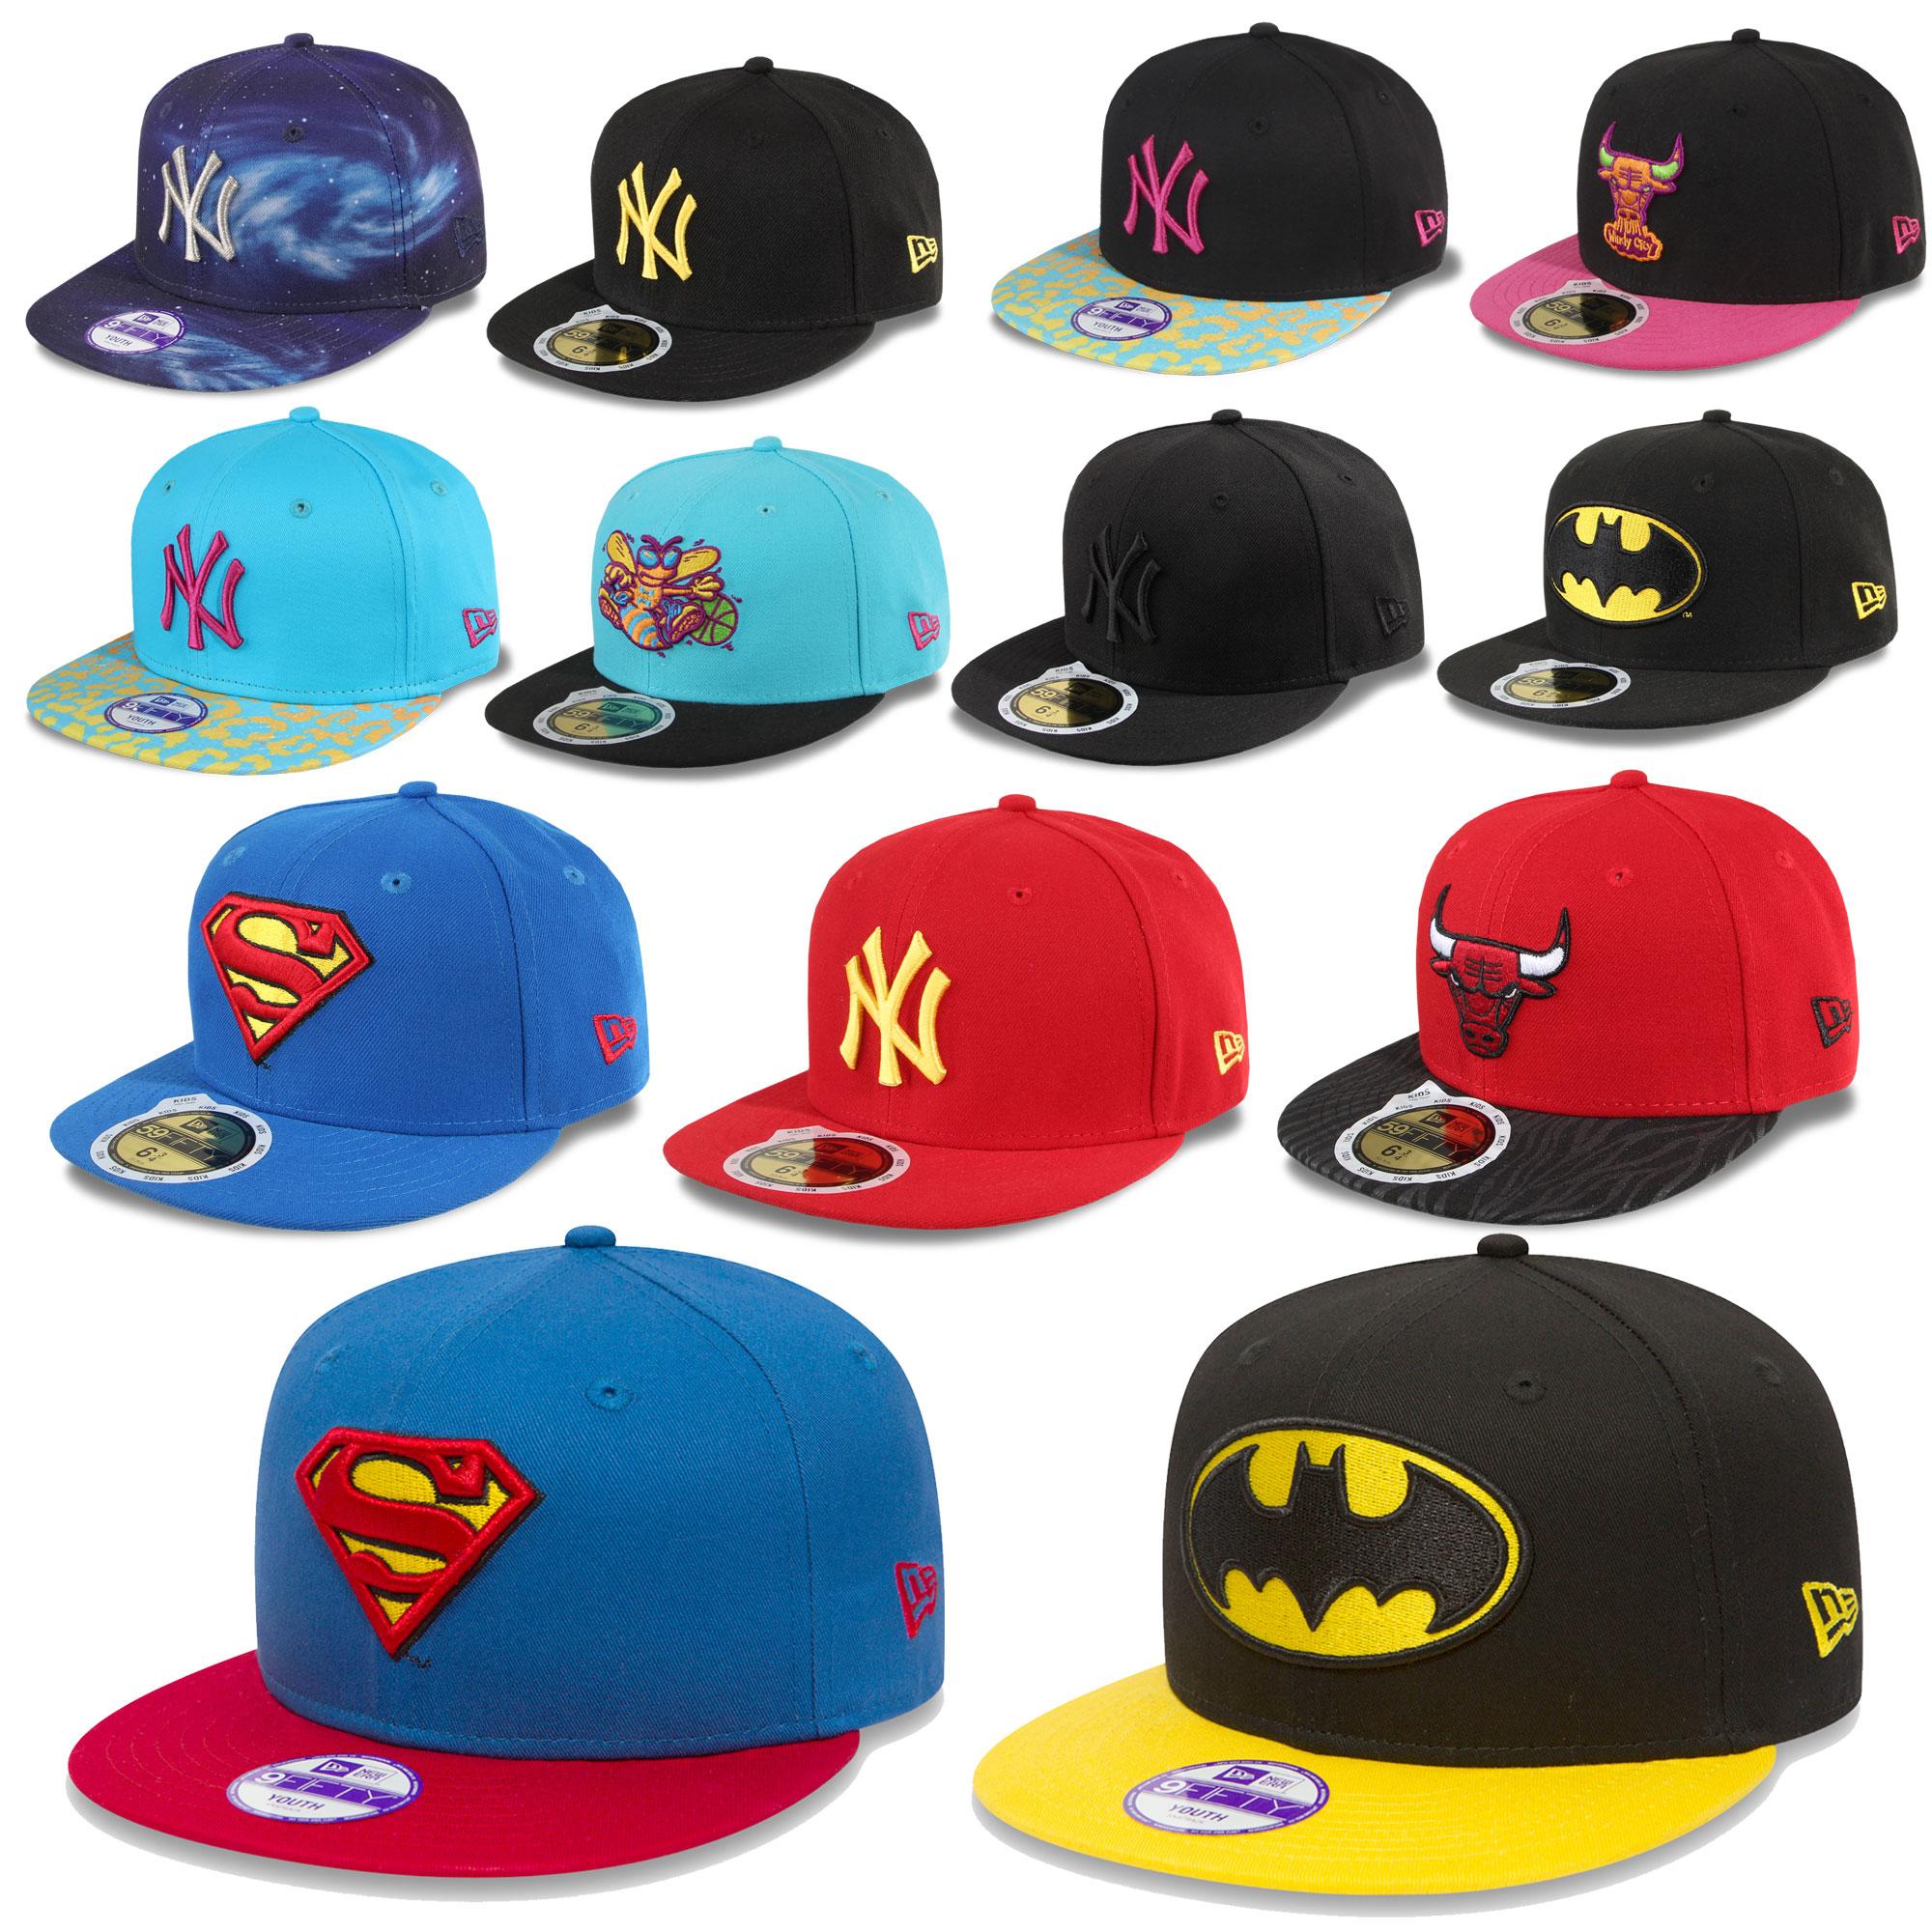 Details about New Era Children Cap Snapback 59fifty Boys Girls Yankees  Batman Superman Bulls 8ccfa9c99b6